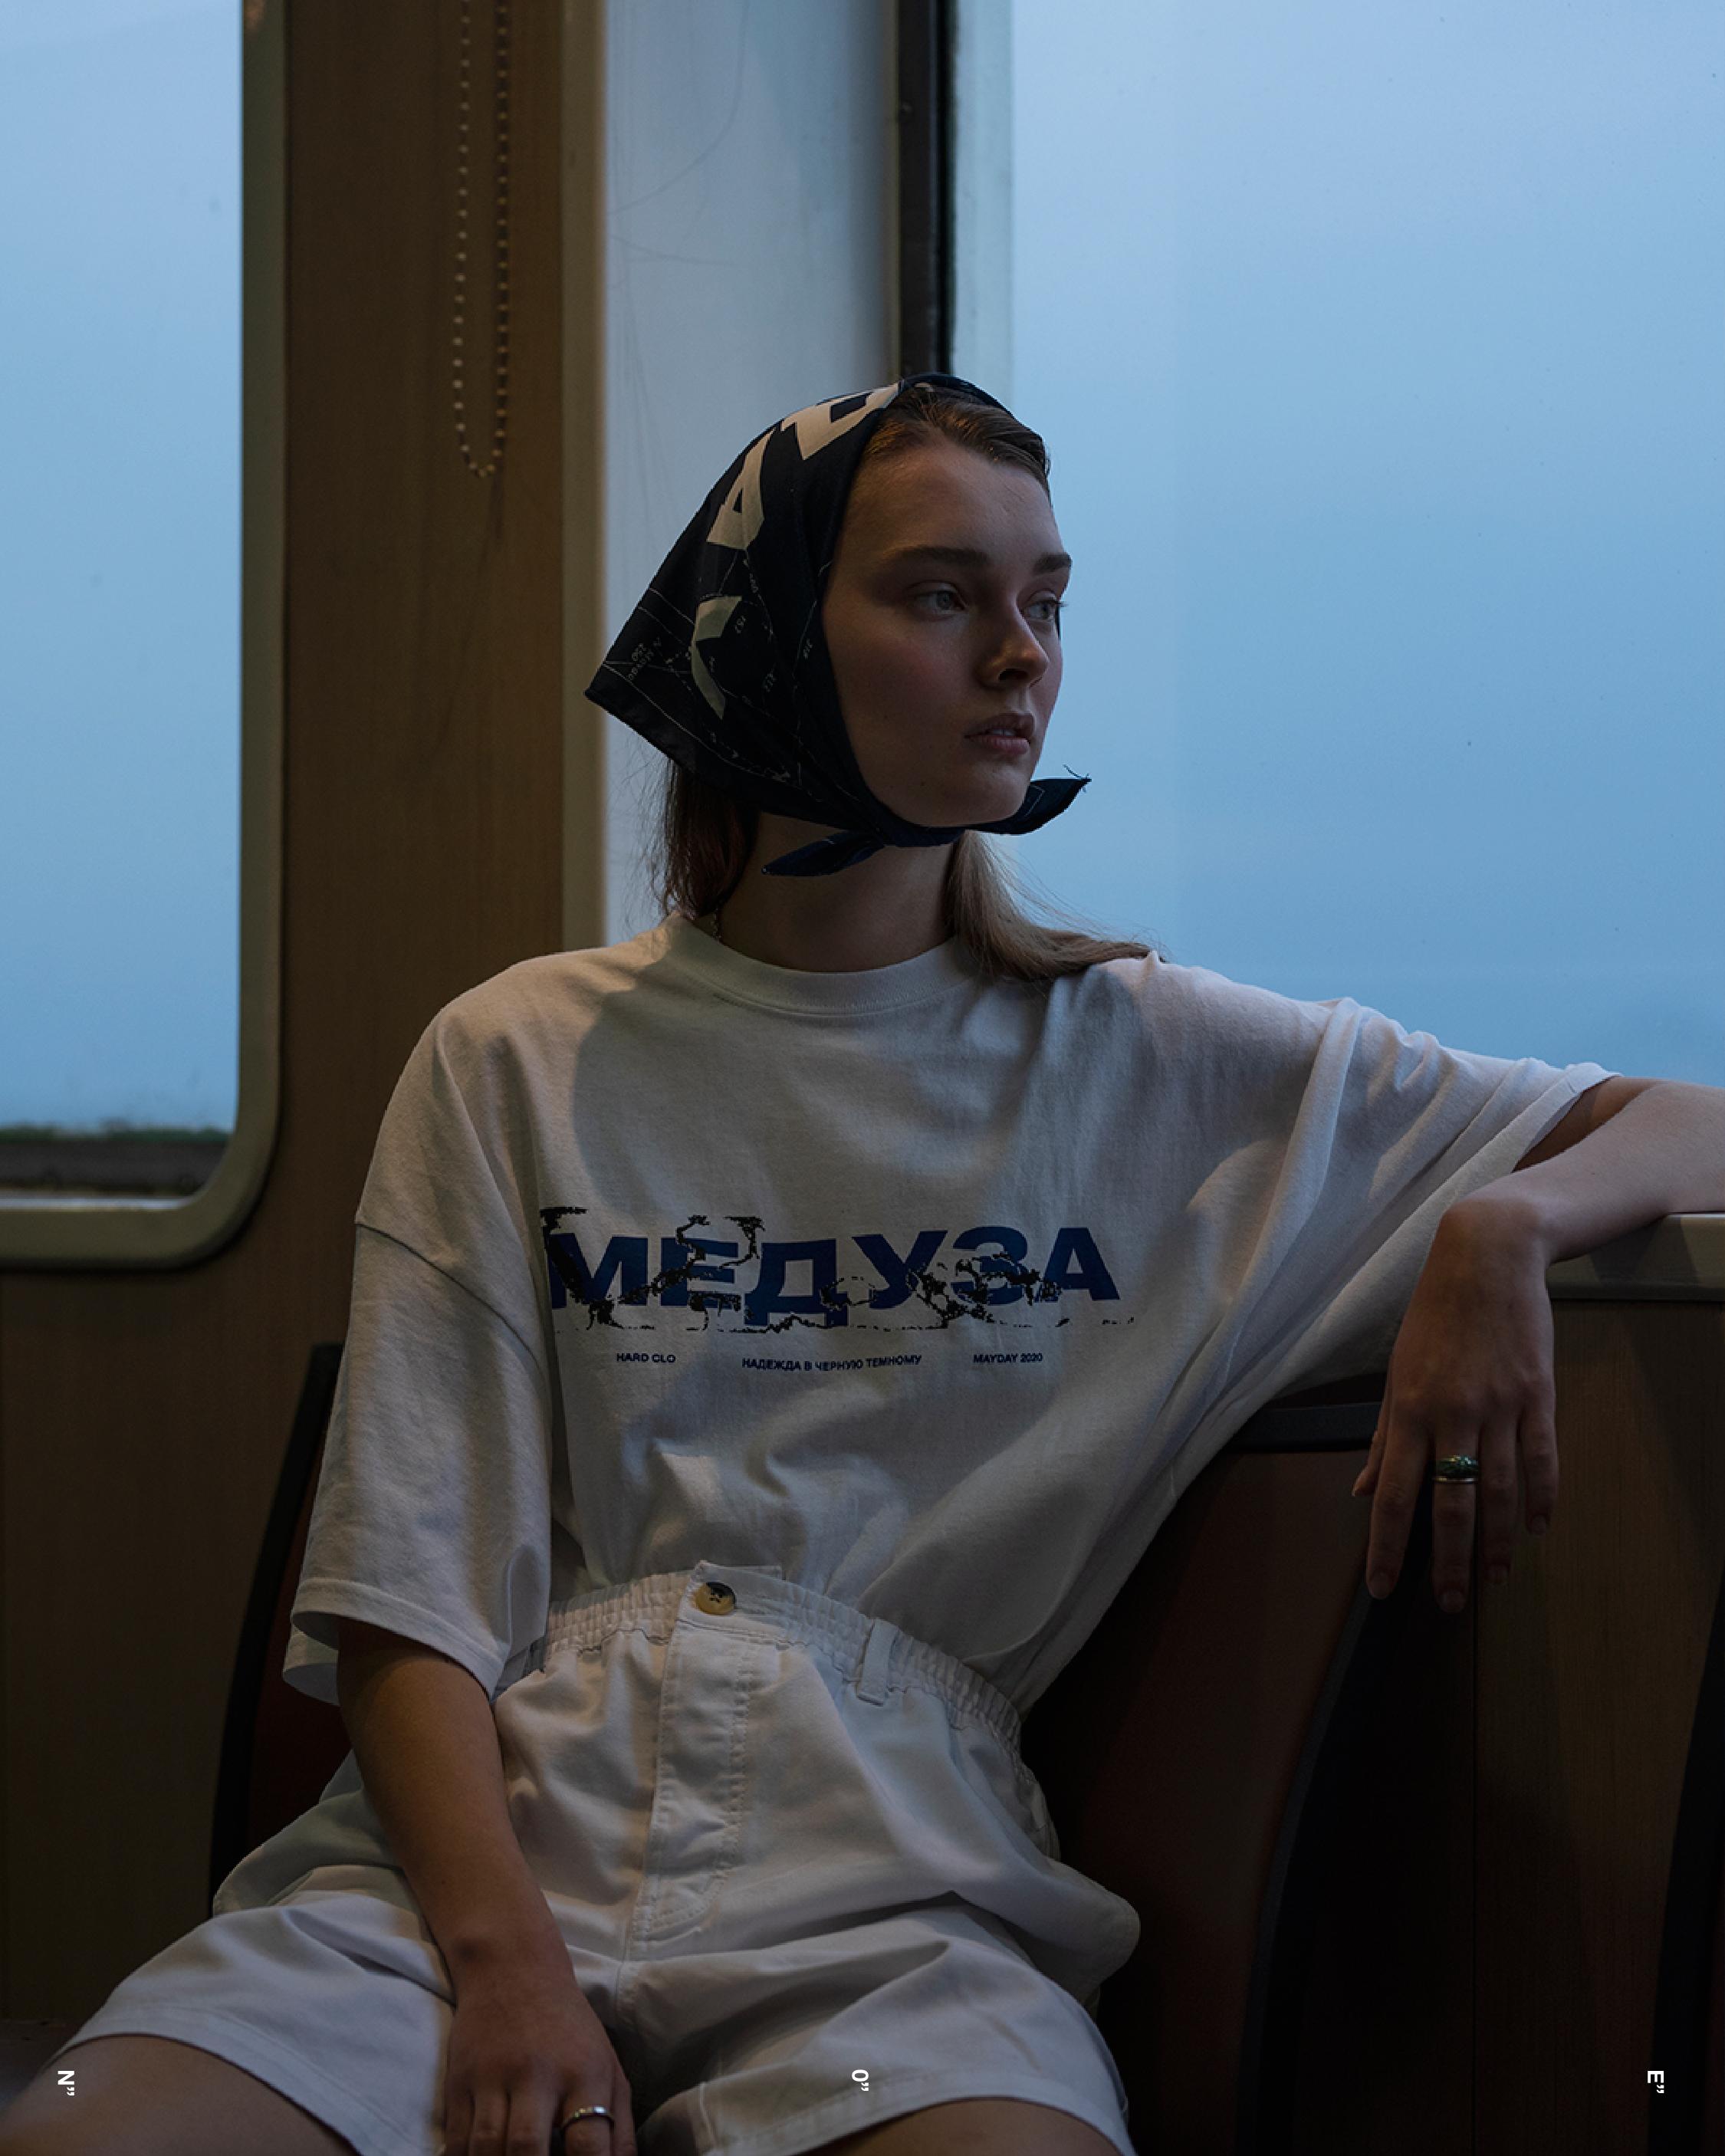 HardClo S/S '20 «Mayday»: Αυτή η νέα συλλογή μόδας εκπέμπει σήμα κινδύνου για τη ζωή και τον πλανήτη